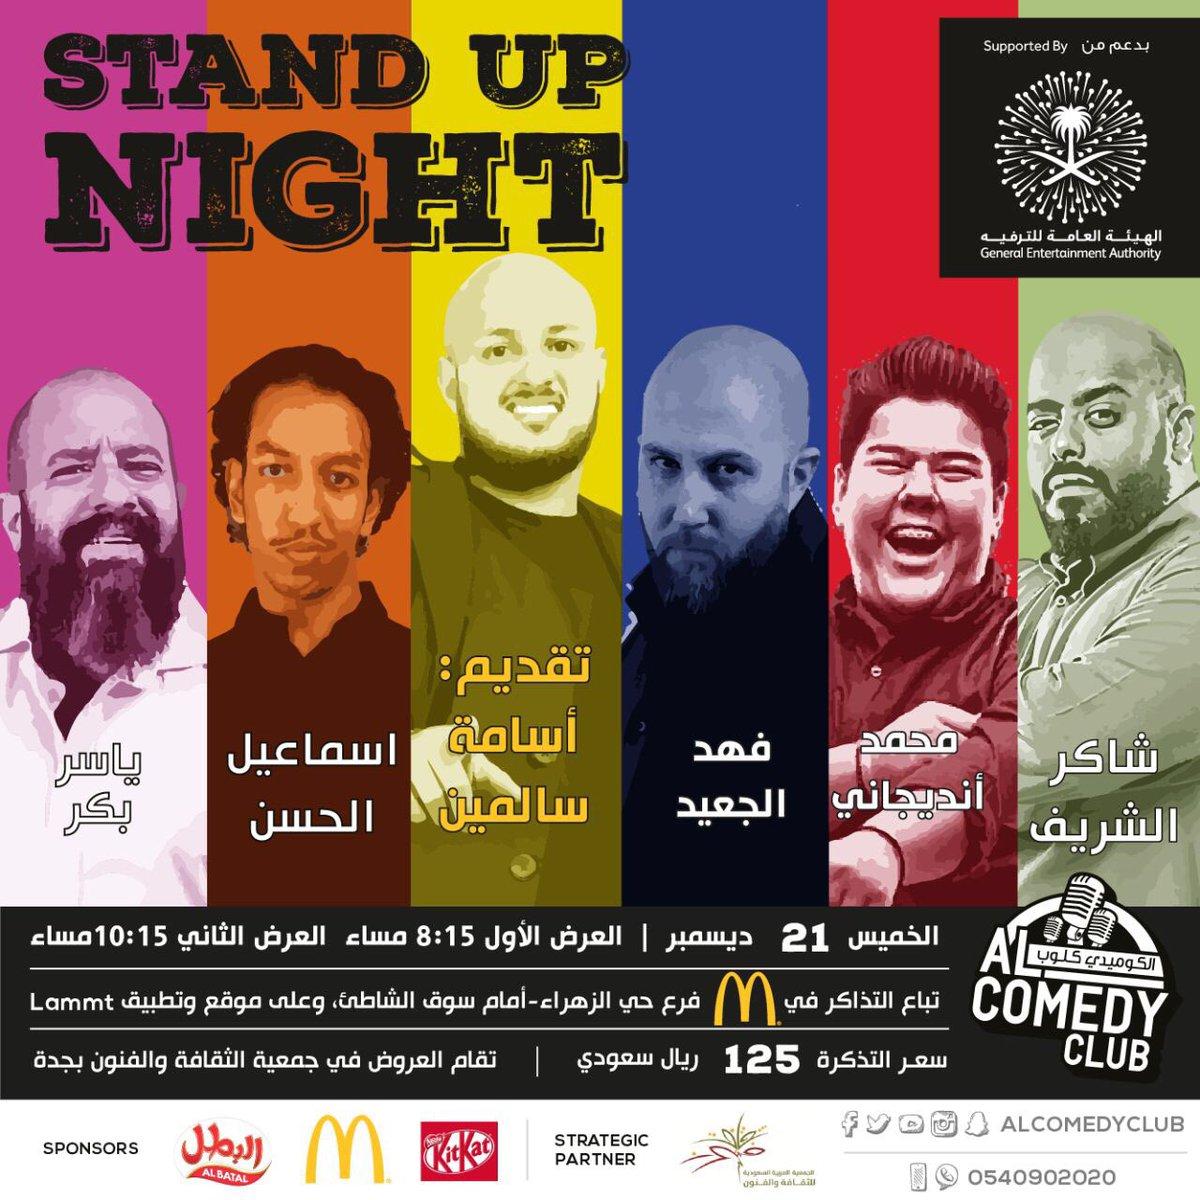 Al Comedy Club Auf Twitter العرض القادم Stand Up Night 2 ليلة كوميدية ١٠٠ مع نجوم الكوميدي كلوب الخميس ٢١ديسمبر التذاكر متوفرة في ماكدونالدز الزهراء أو موقع لمة Https T Co Tucs8chllc Https T Co Ryqtrw5orh